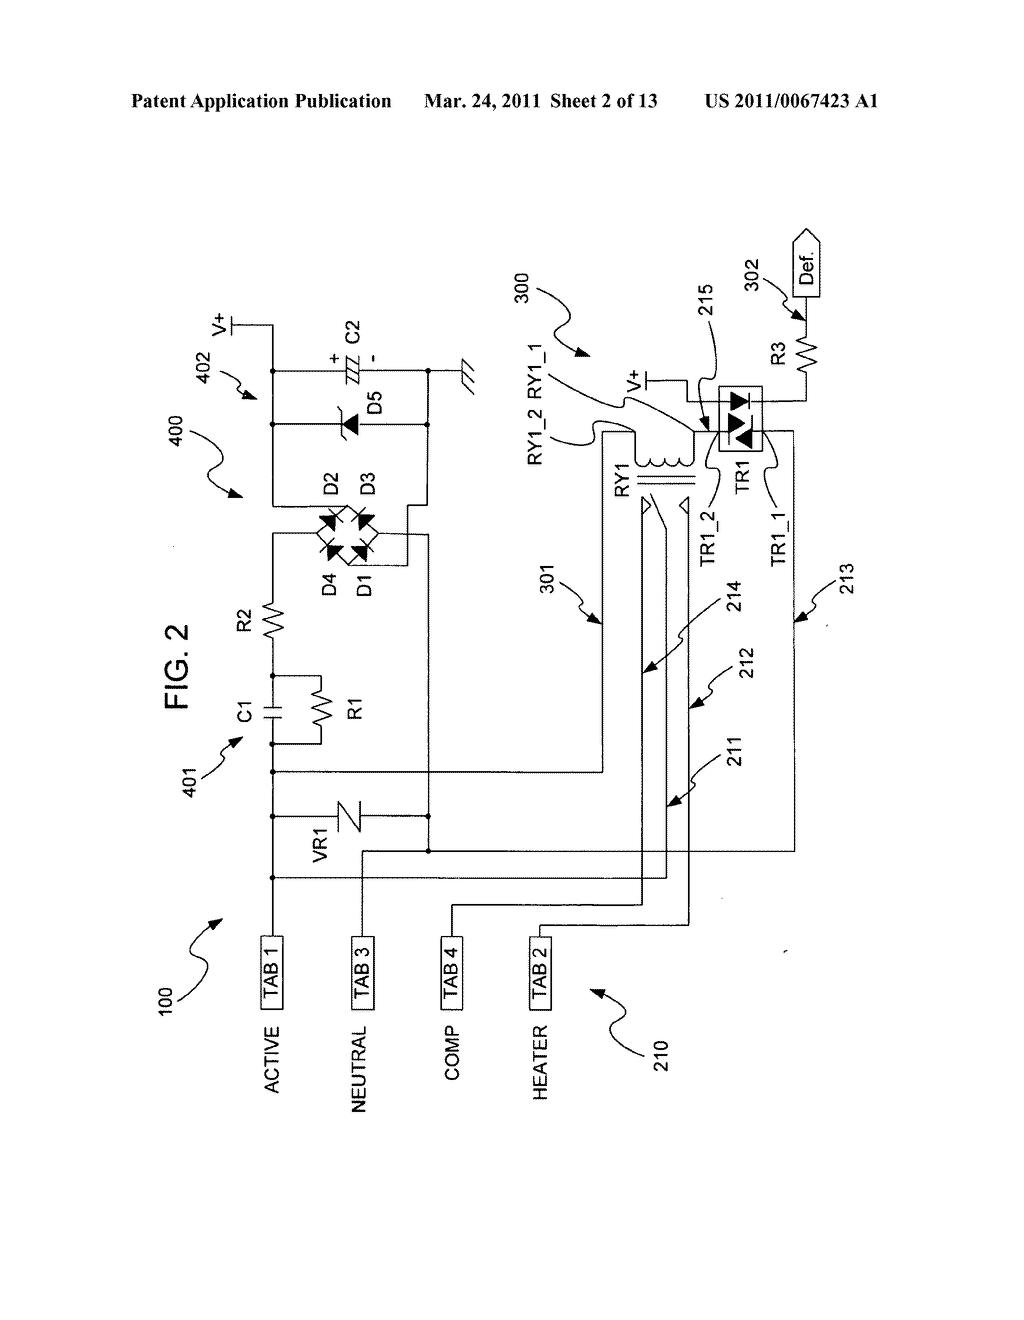 Defrost Timer Diagram Detailed Schematics 8141 20 Wiring For Refrigerator And Schematic Precision